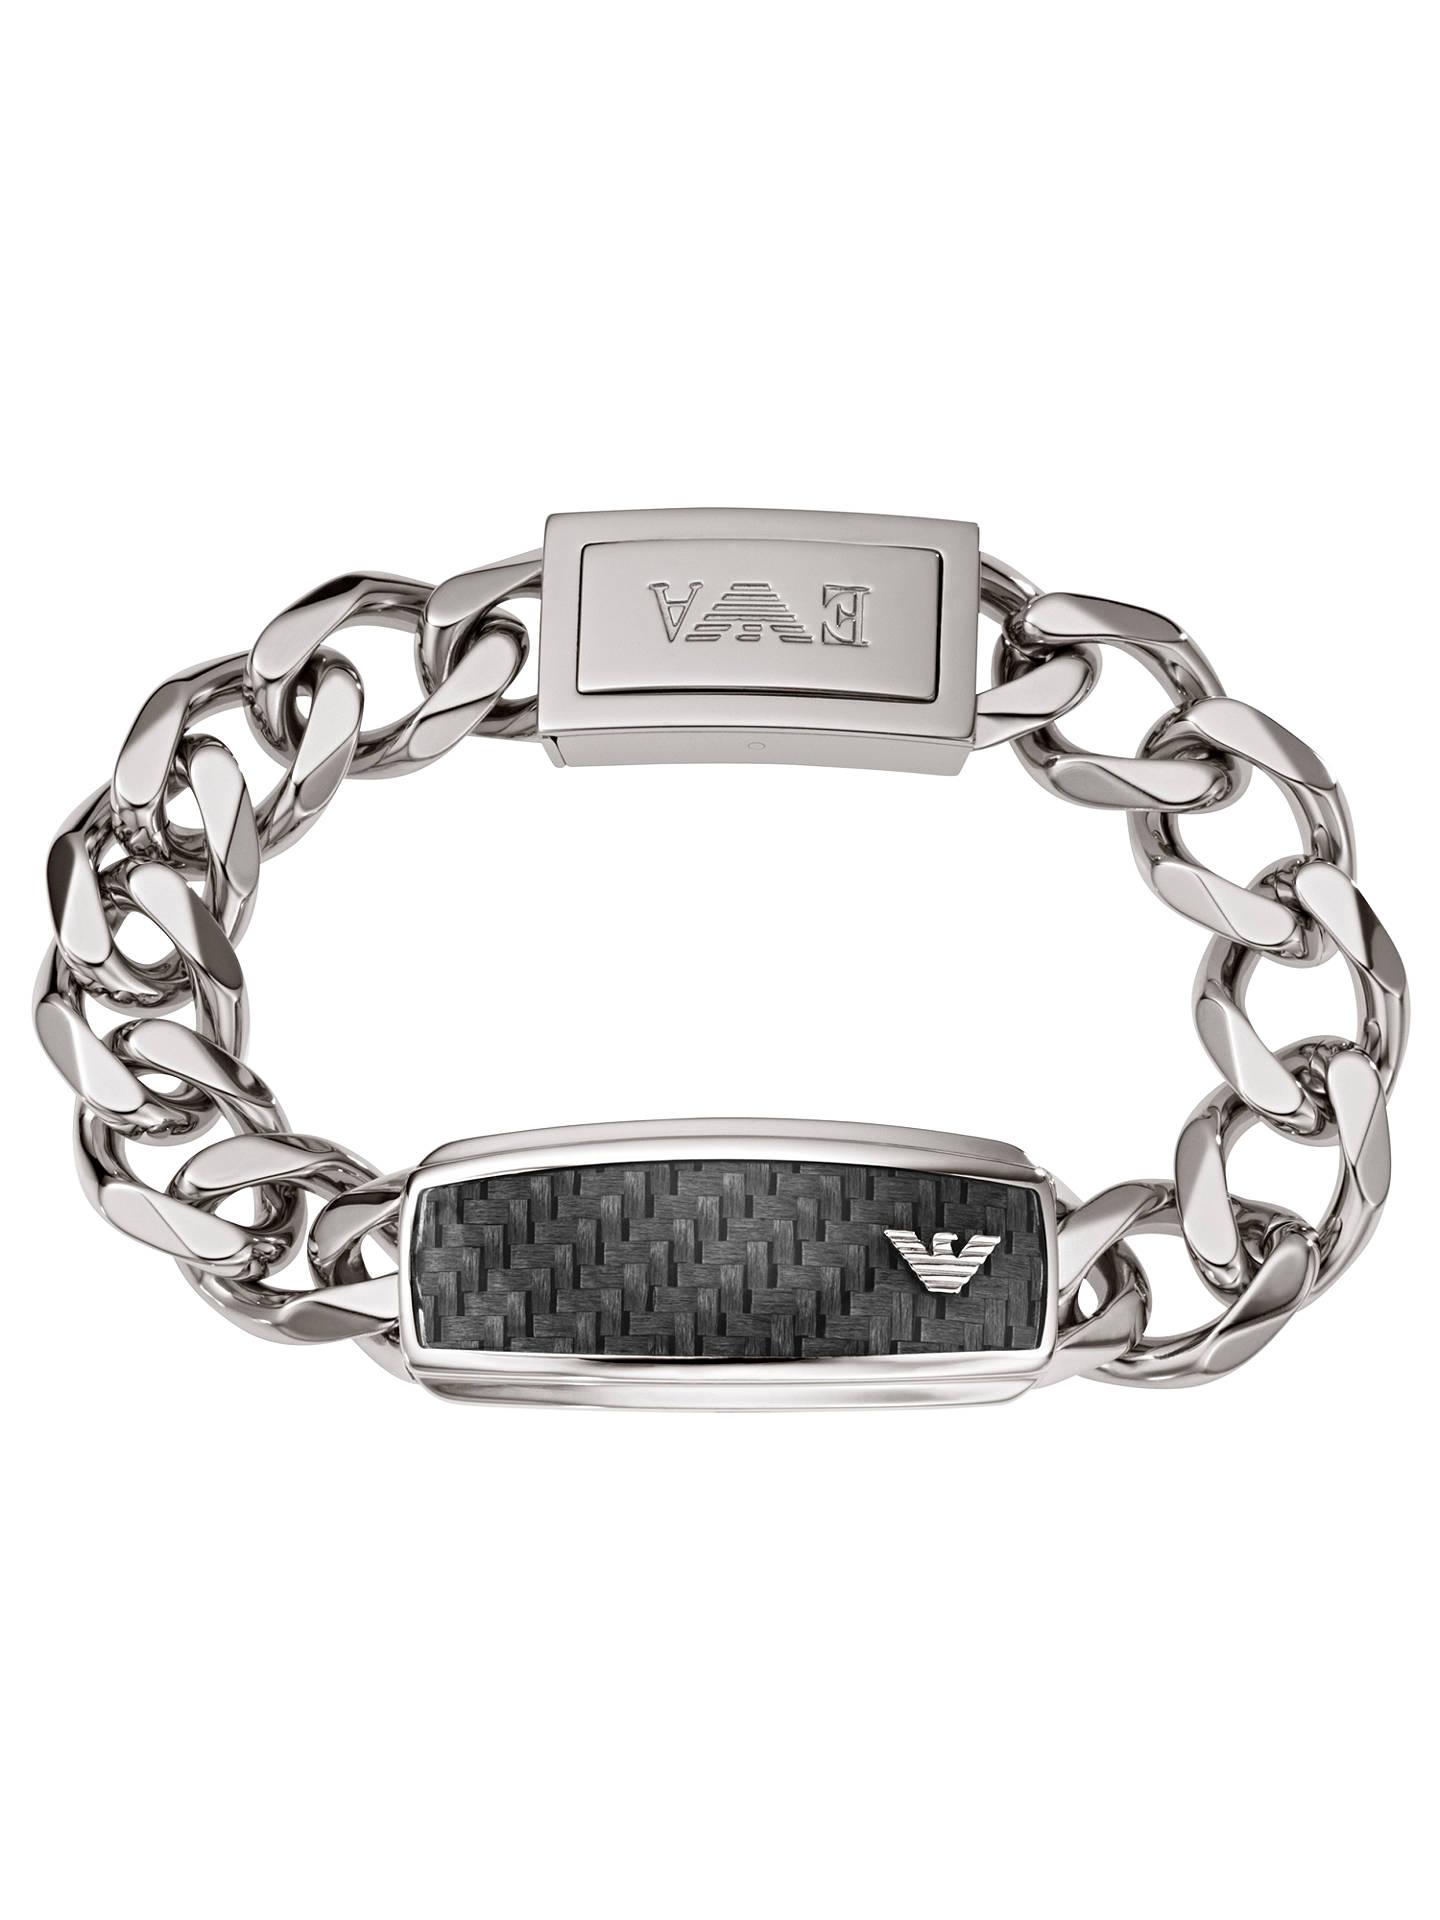 5a91b97c Emporio Armani Men's Stainless Steel Chunky Chain Bracelet, Black/Silver